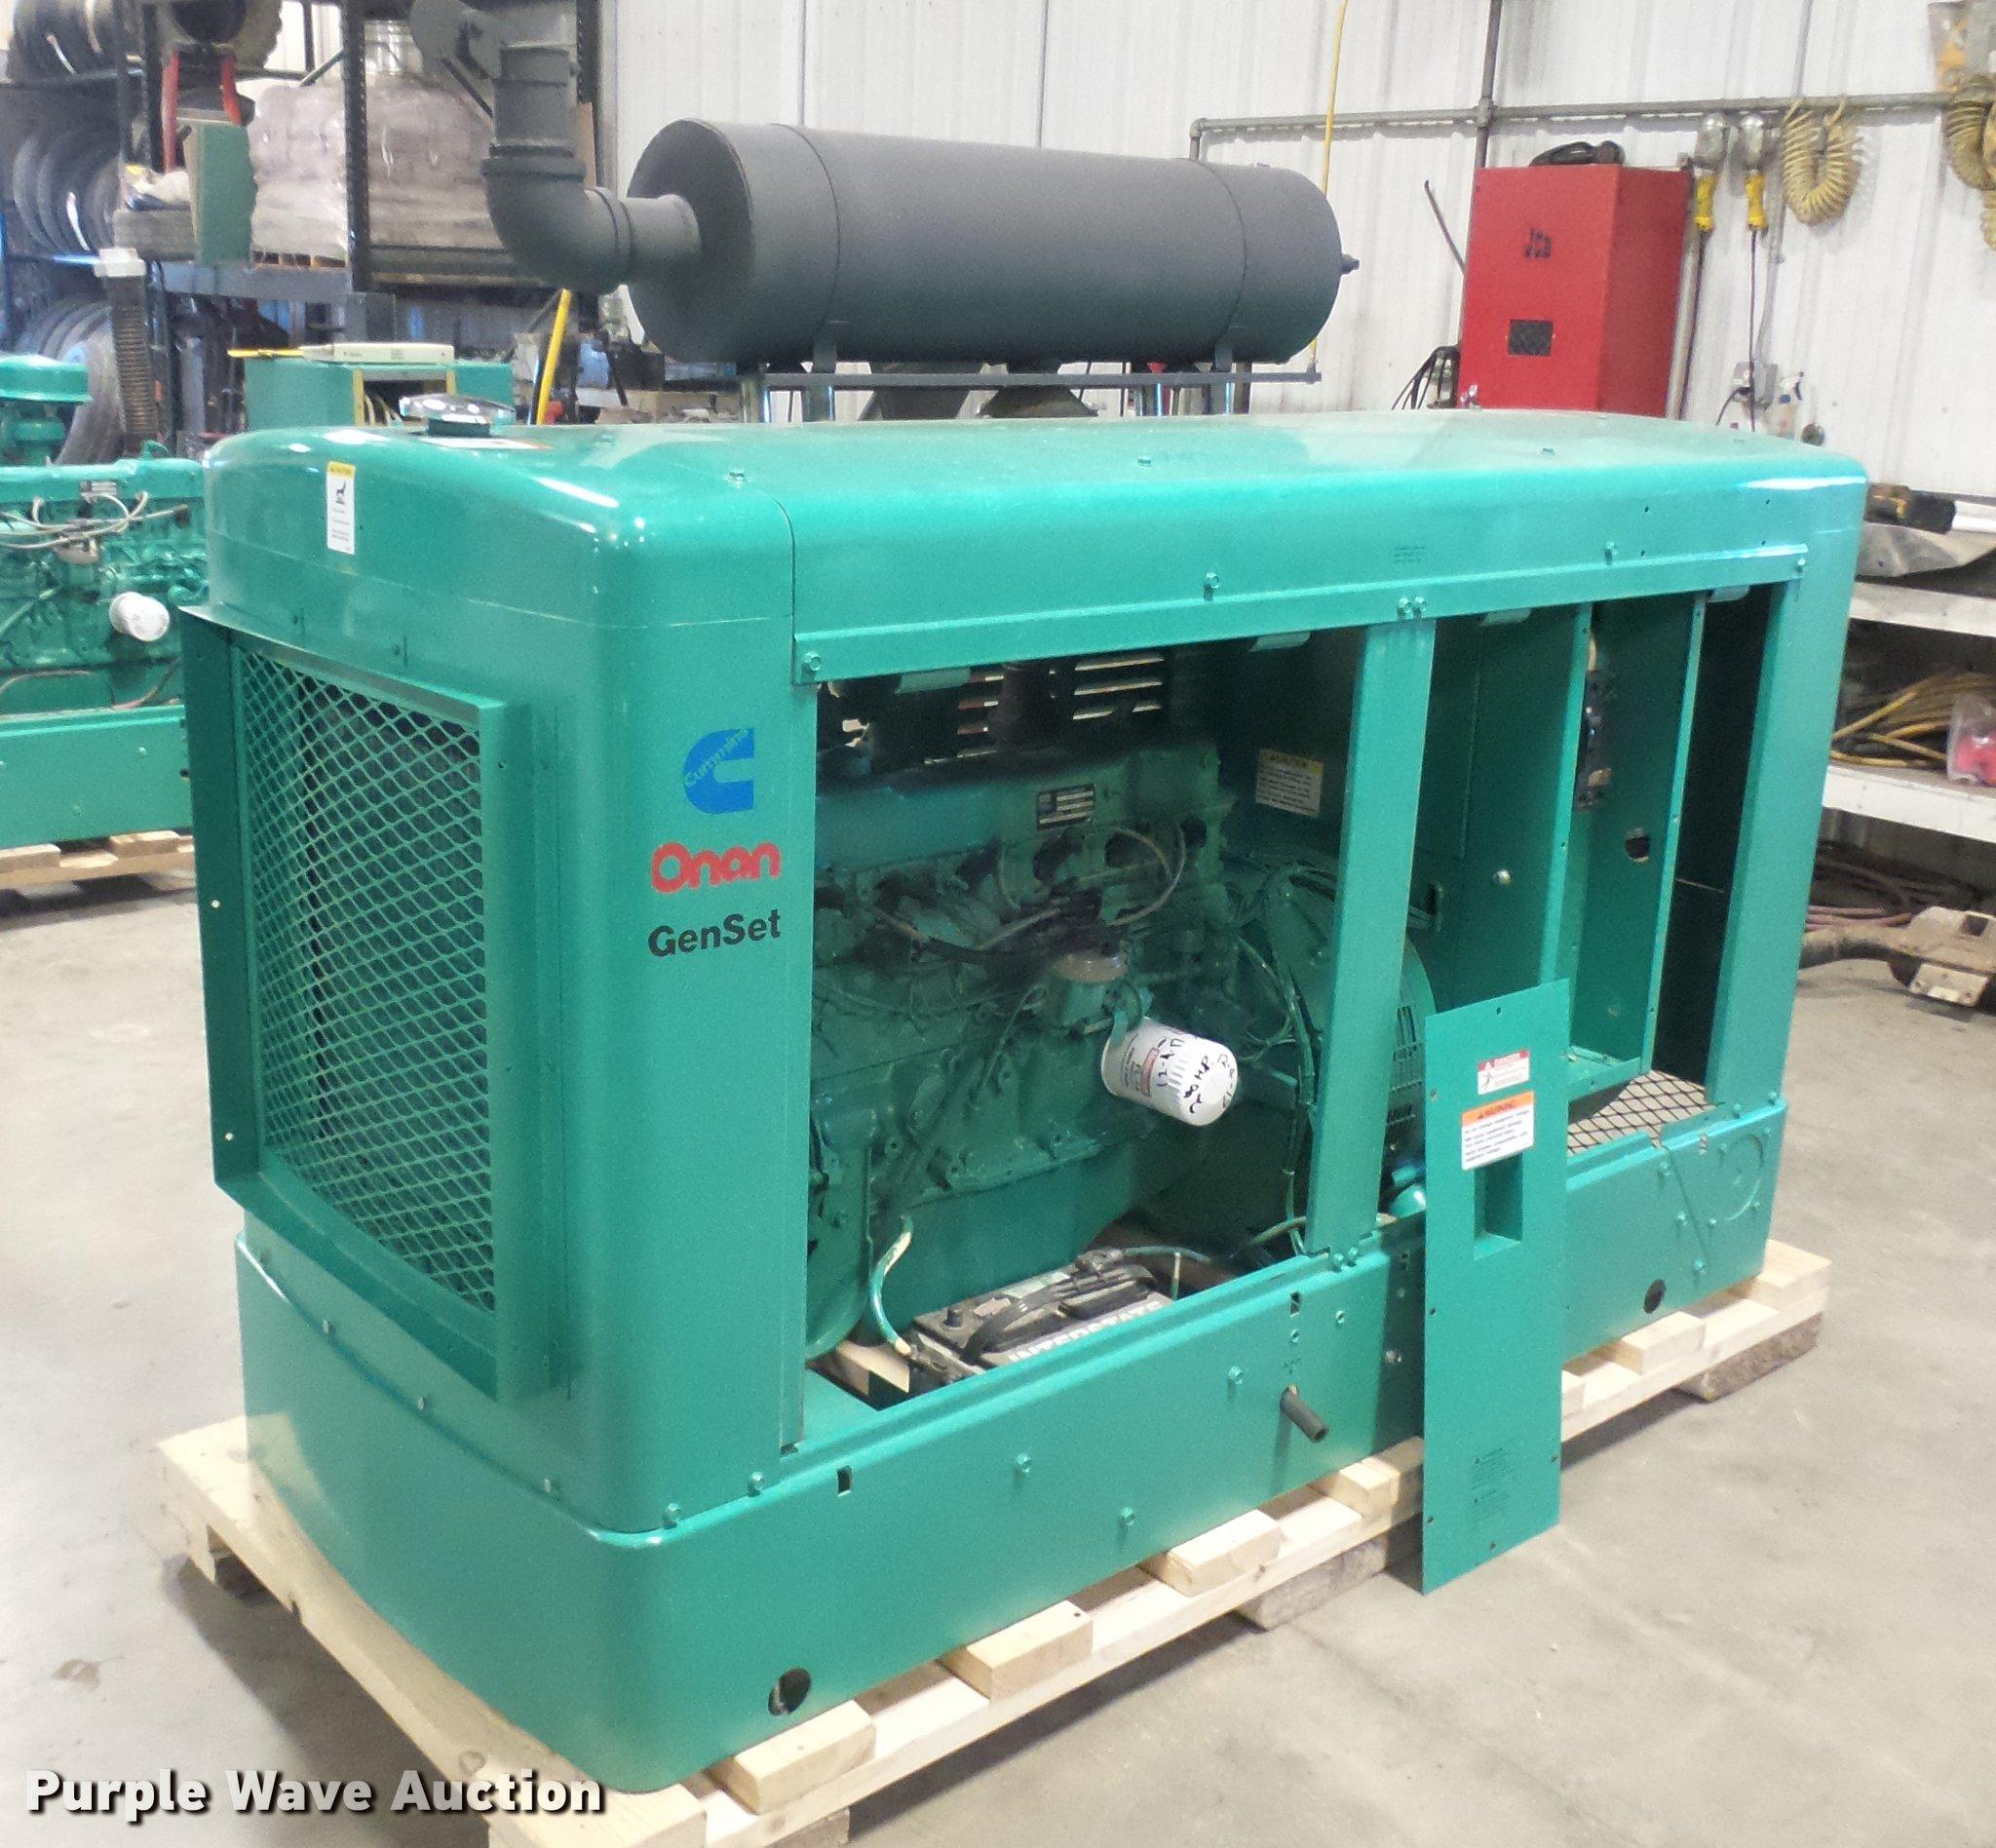 Cummins Onan 35ek Generator With Transfer Switch Item Dx99 Propane Wiring Diagram Full Size In New Window